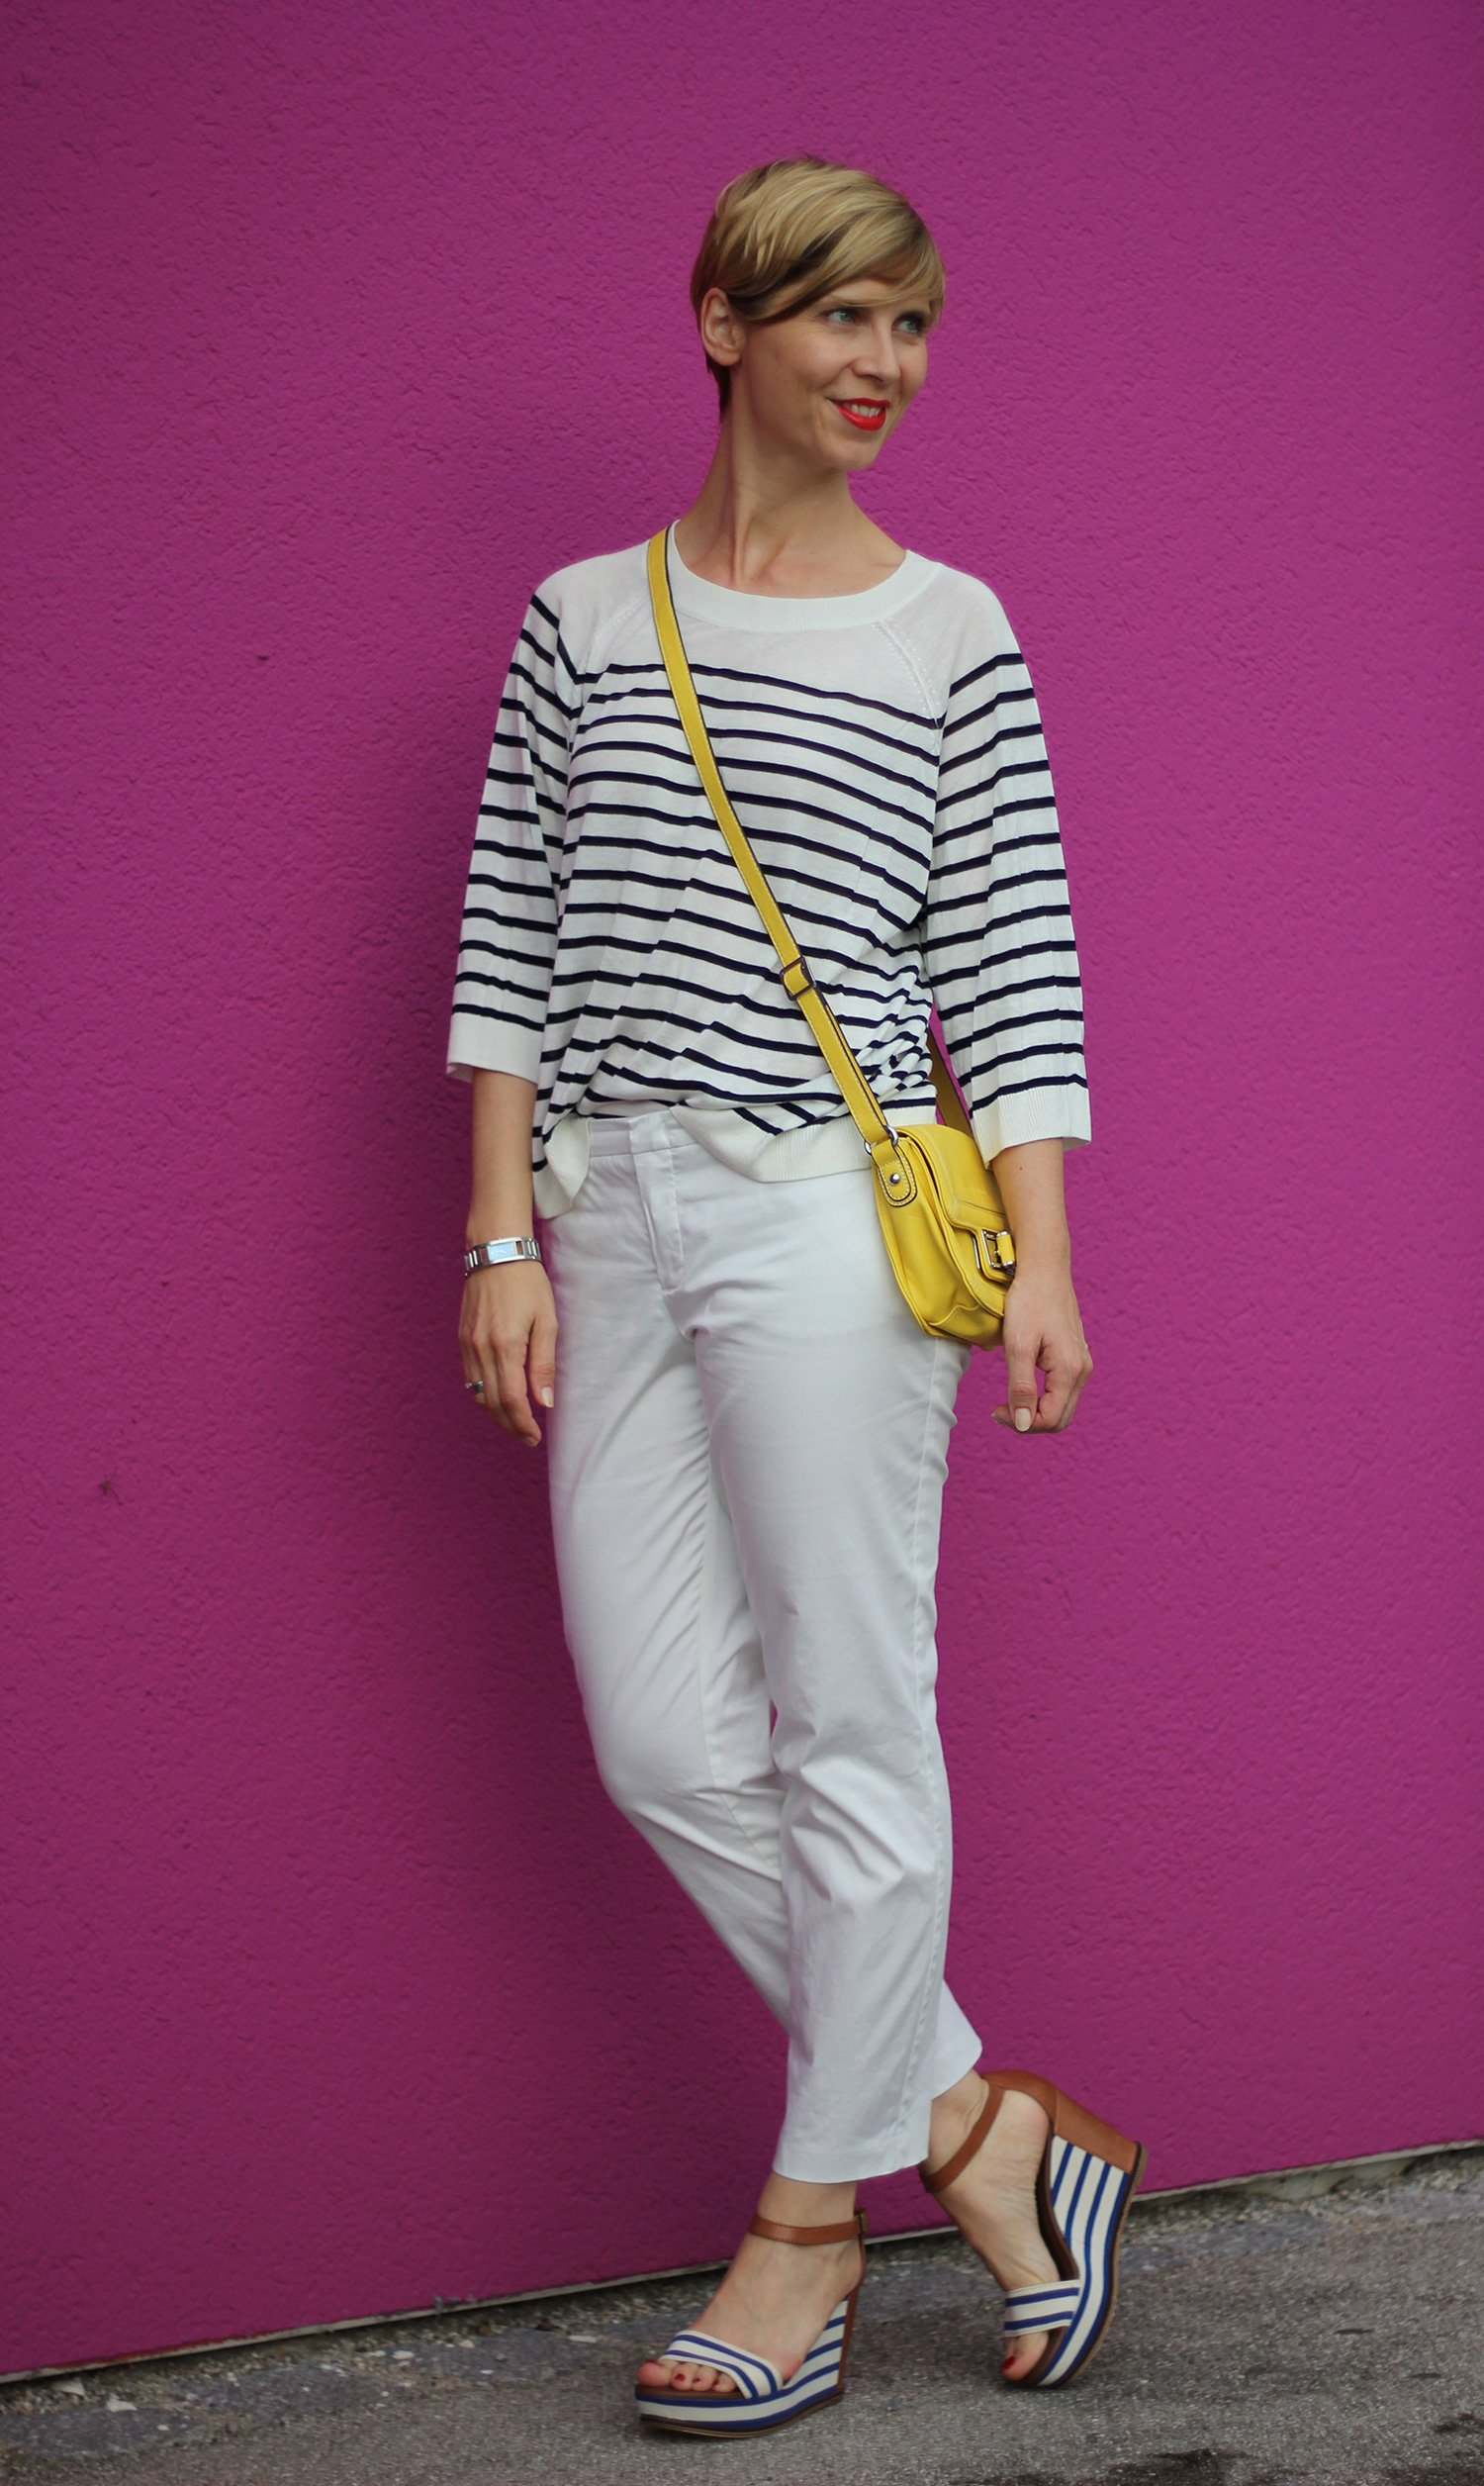 IMG_8237a_OUI_hose_weisse_weiß_white_Streifen_stripes_blue_white_Marcopolo_H&M_Shirt